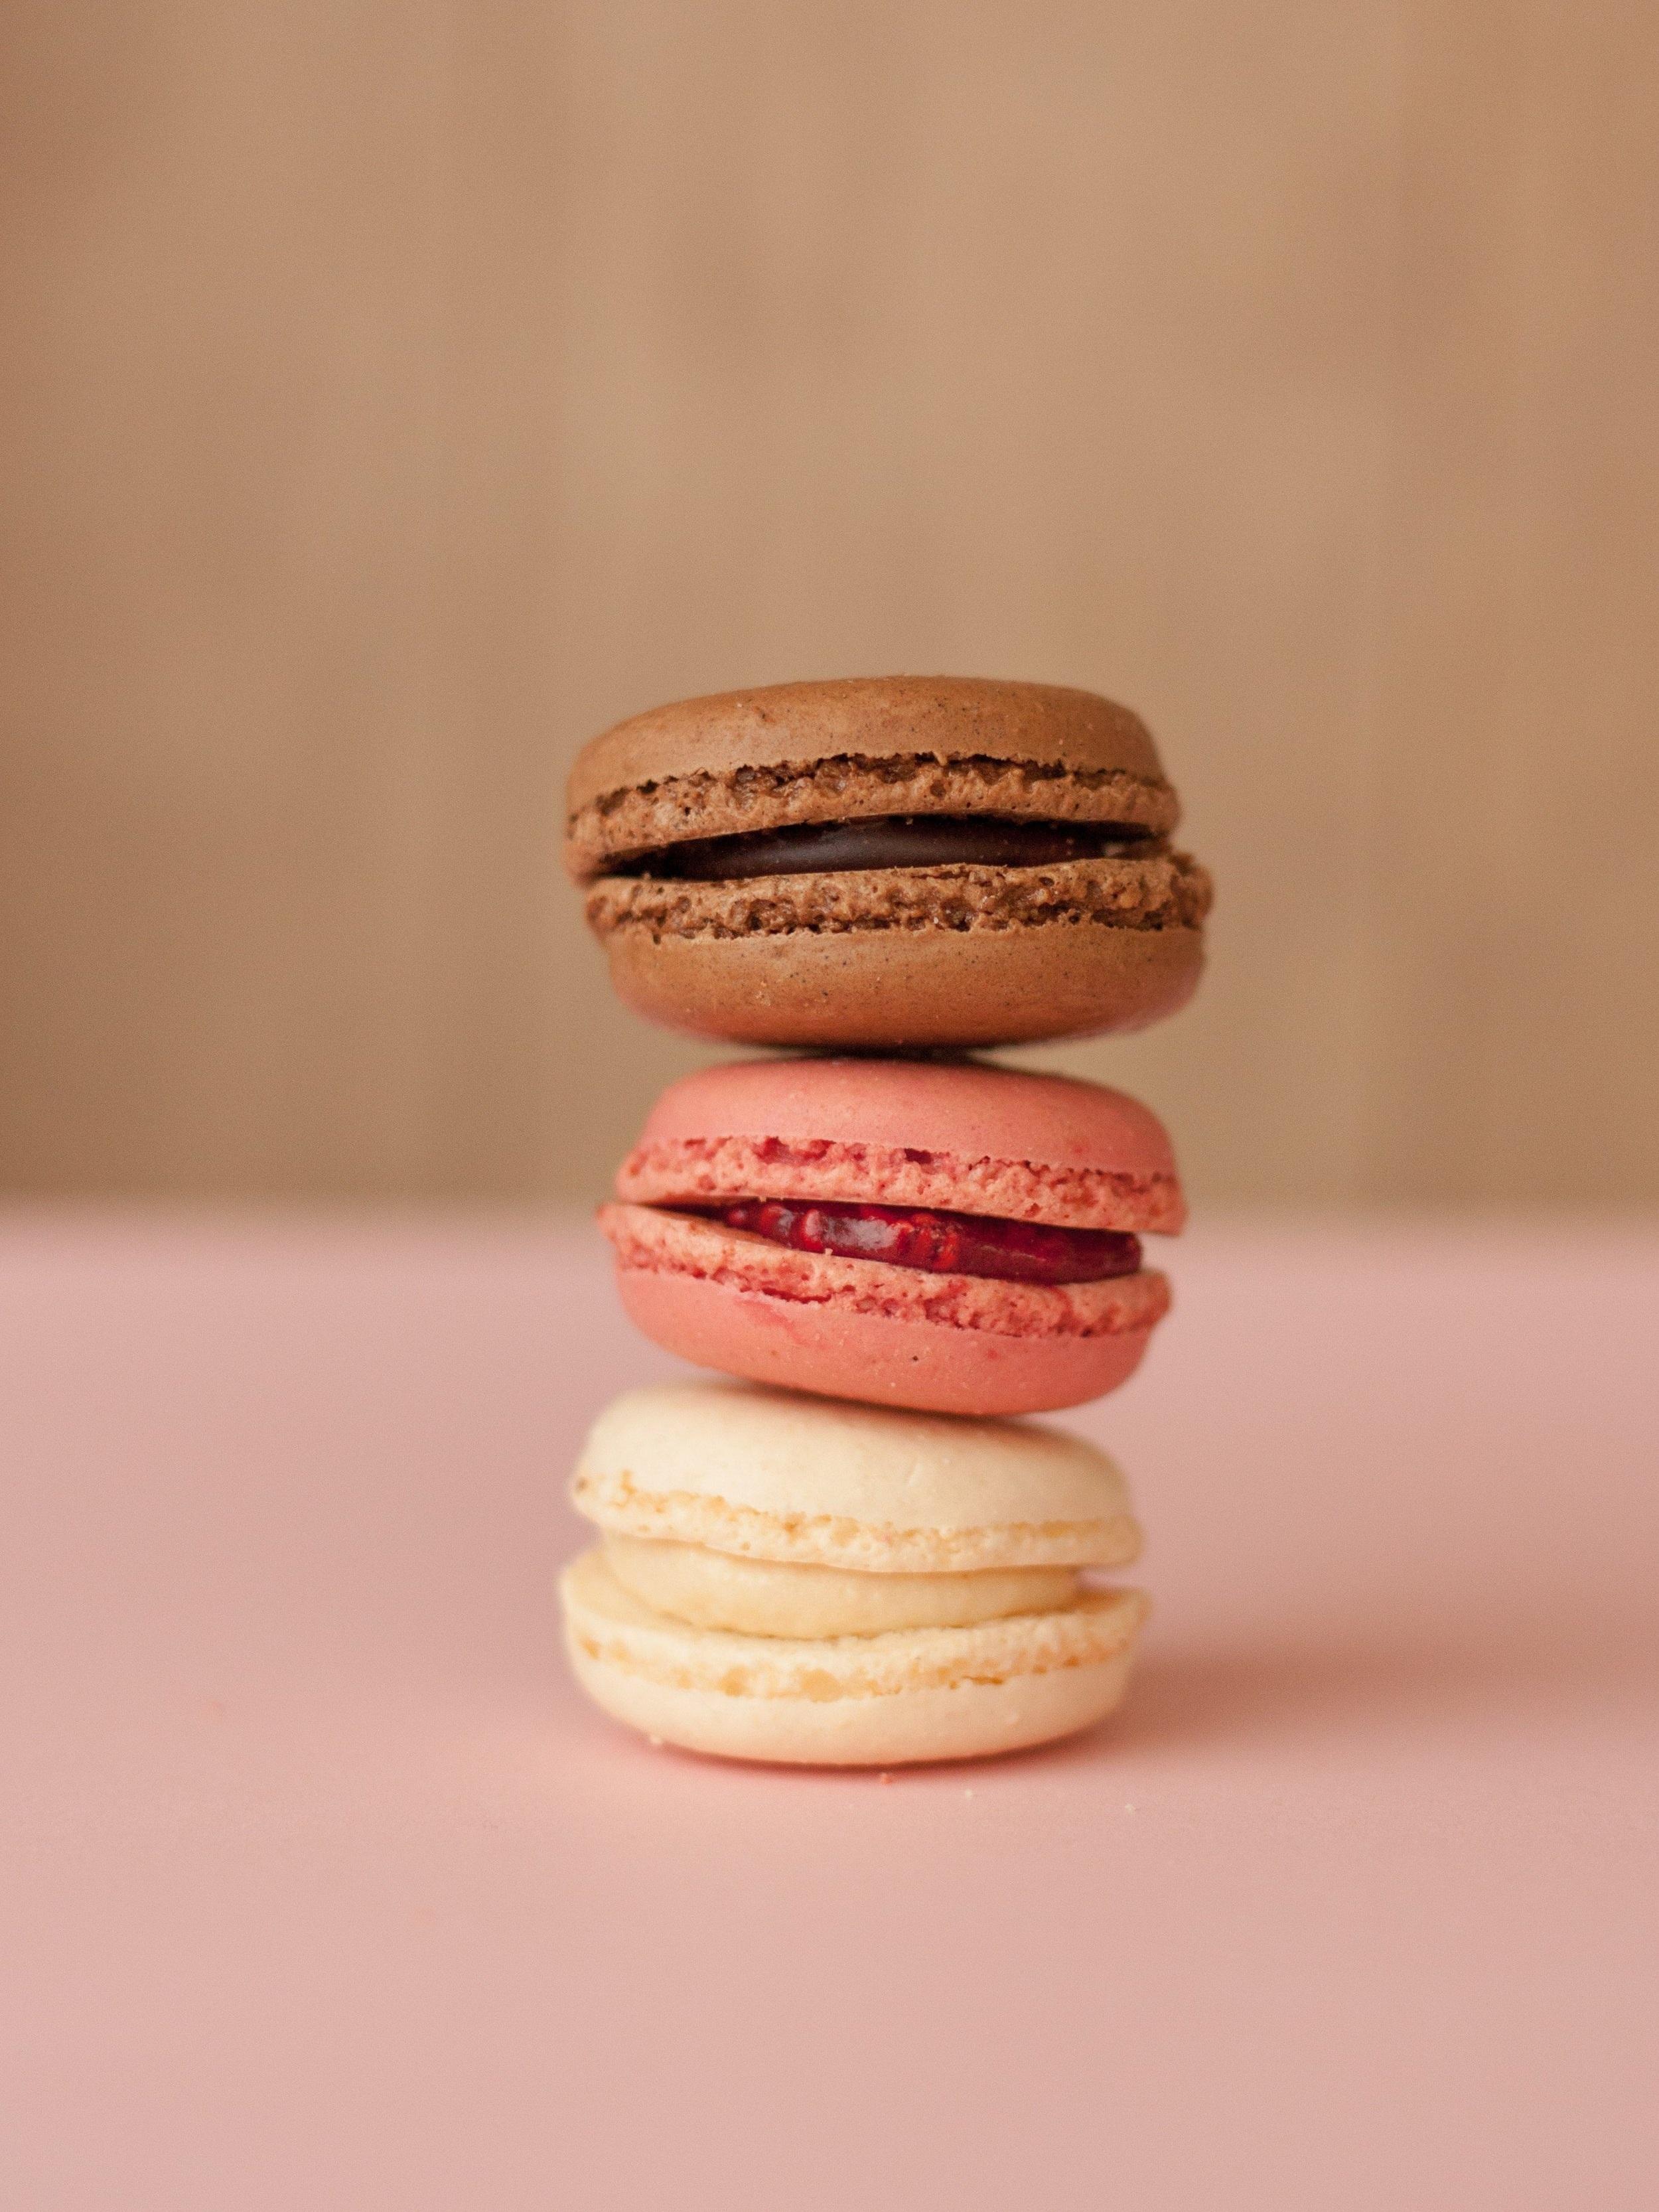 balance-food-french-6747.jpg